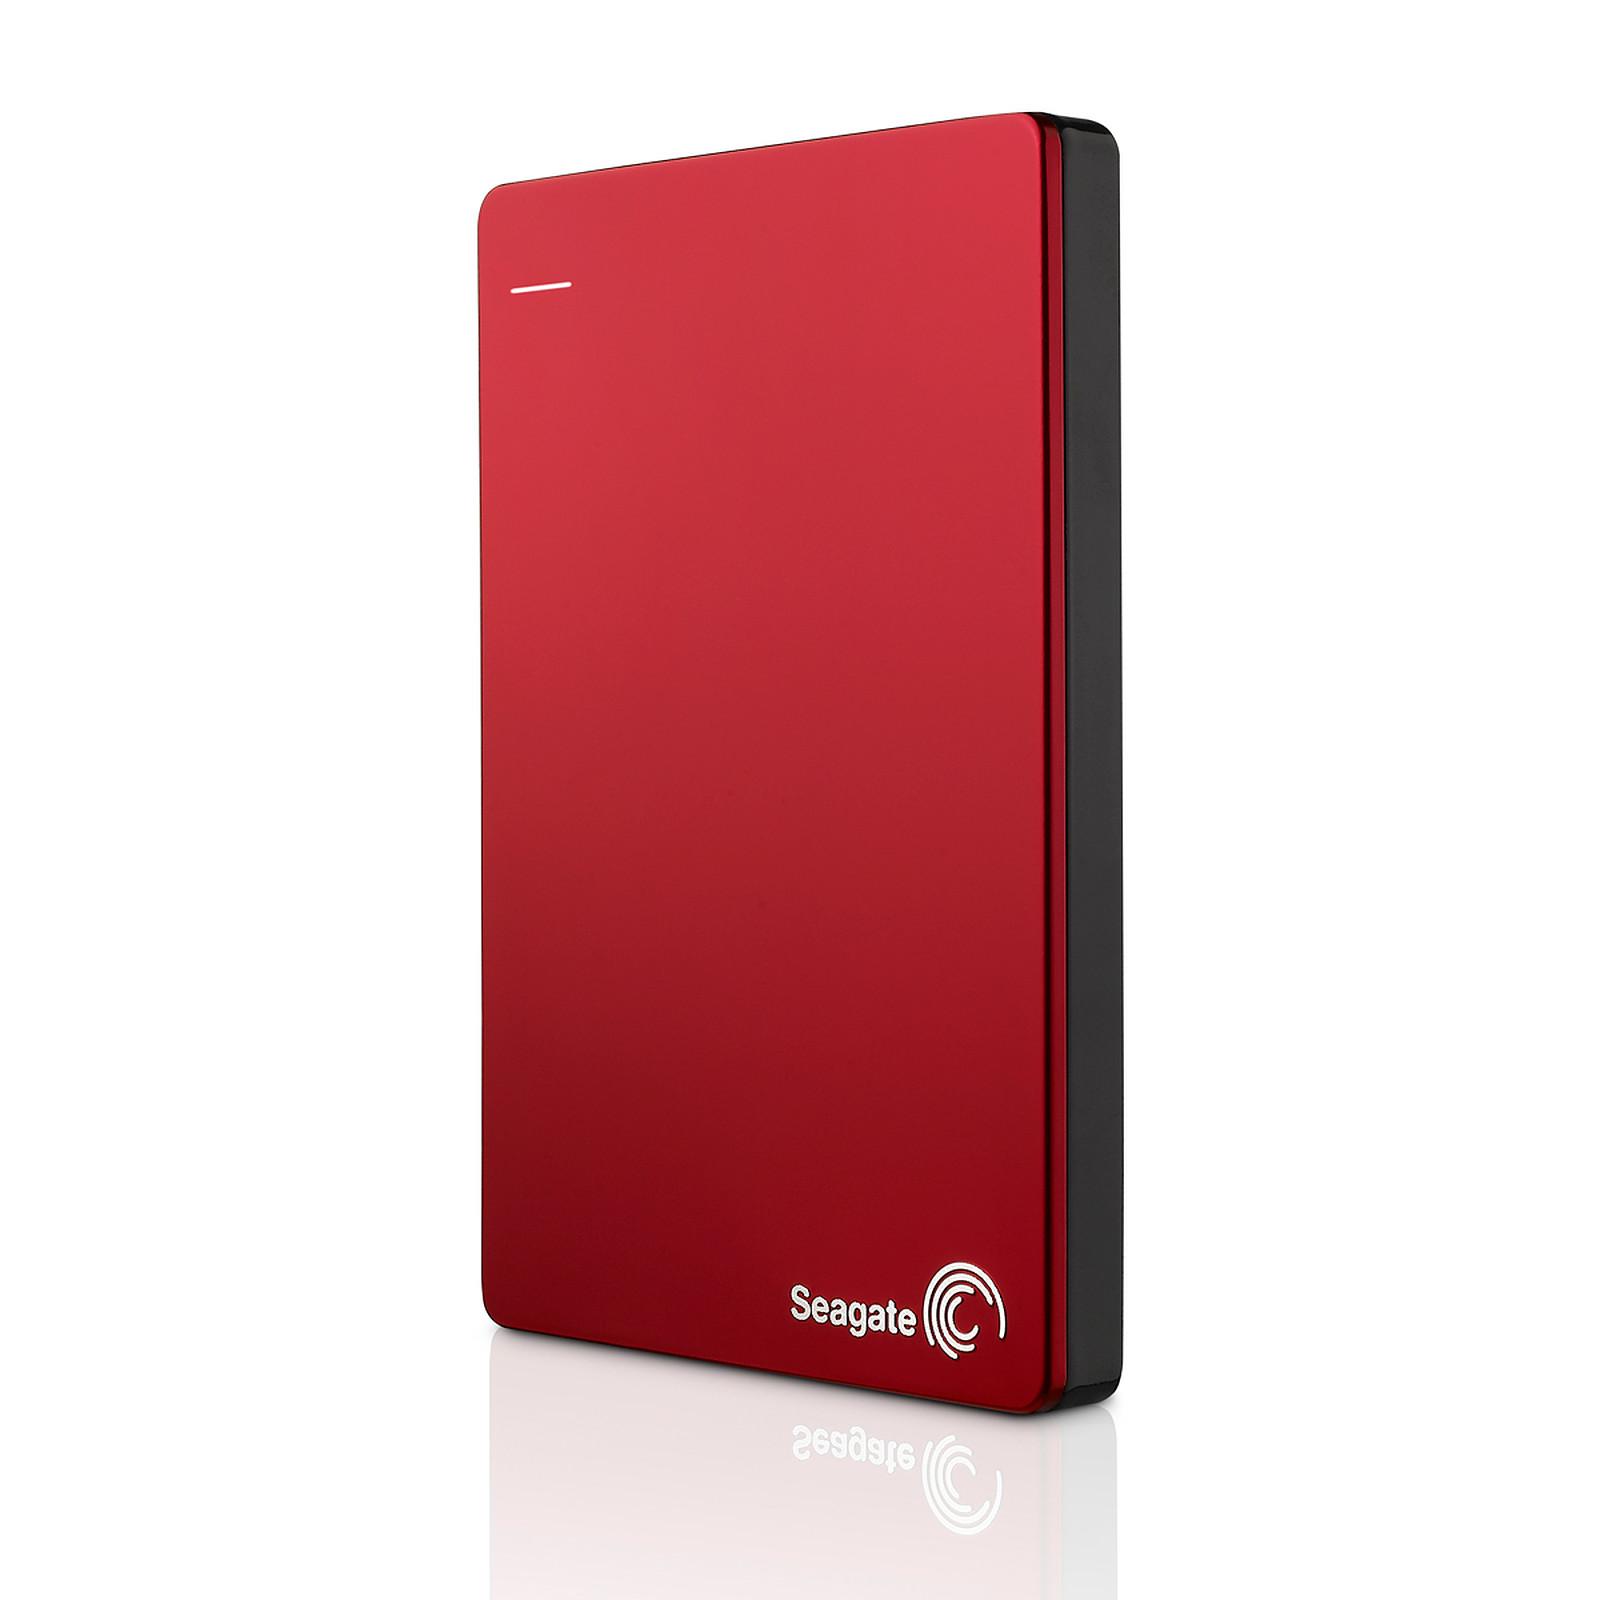 Seagate Backup Plus Slim 2 To Rouge (USB 3.0)